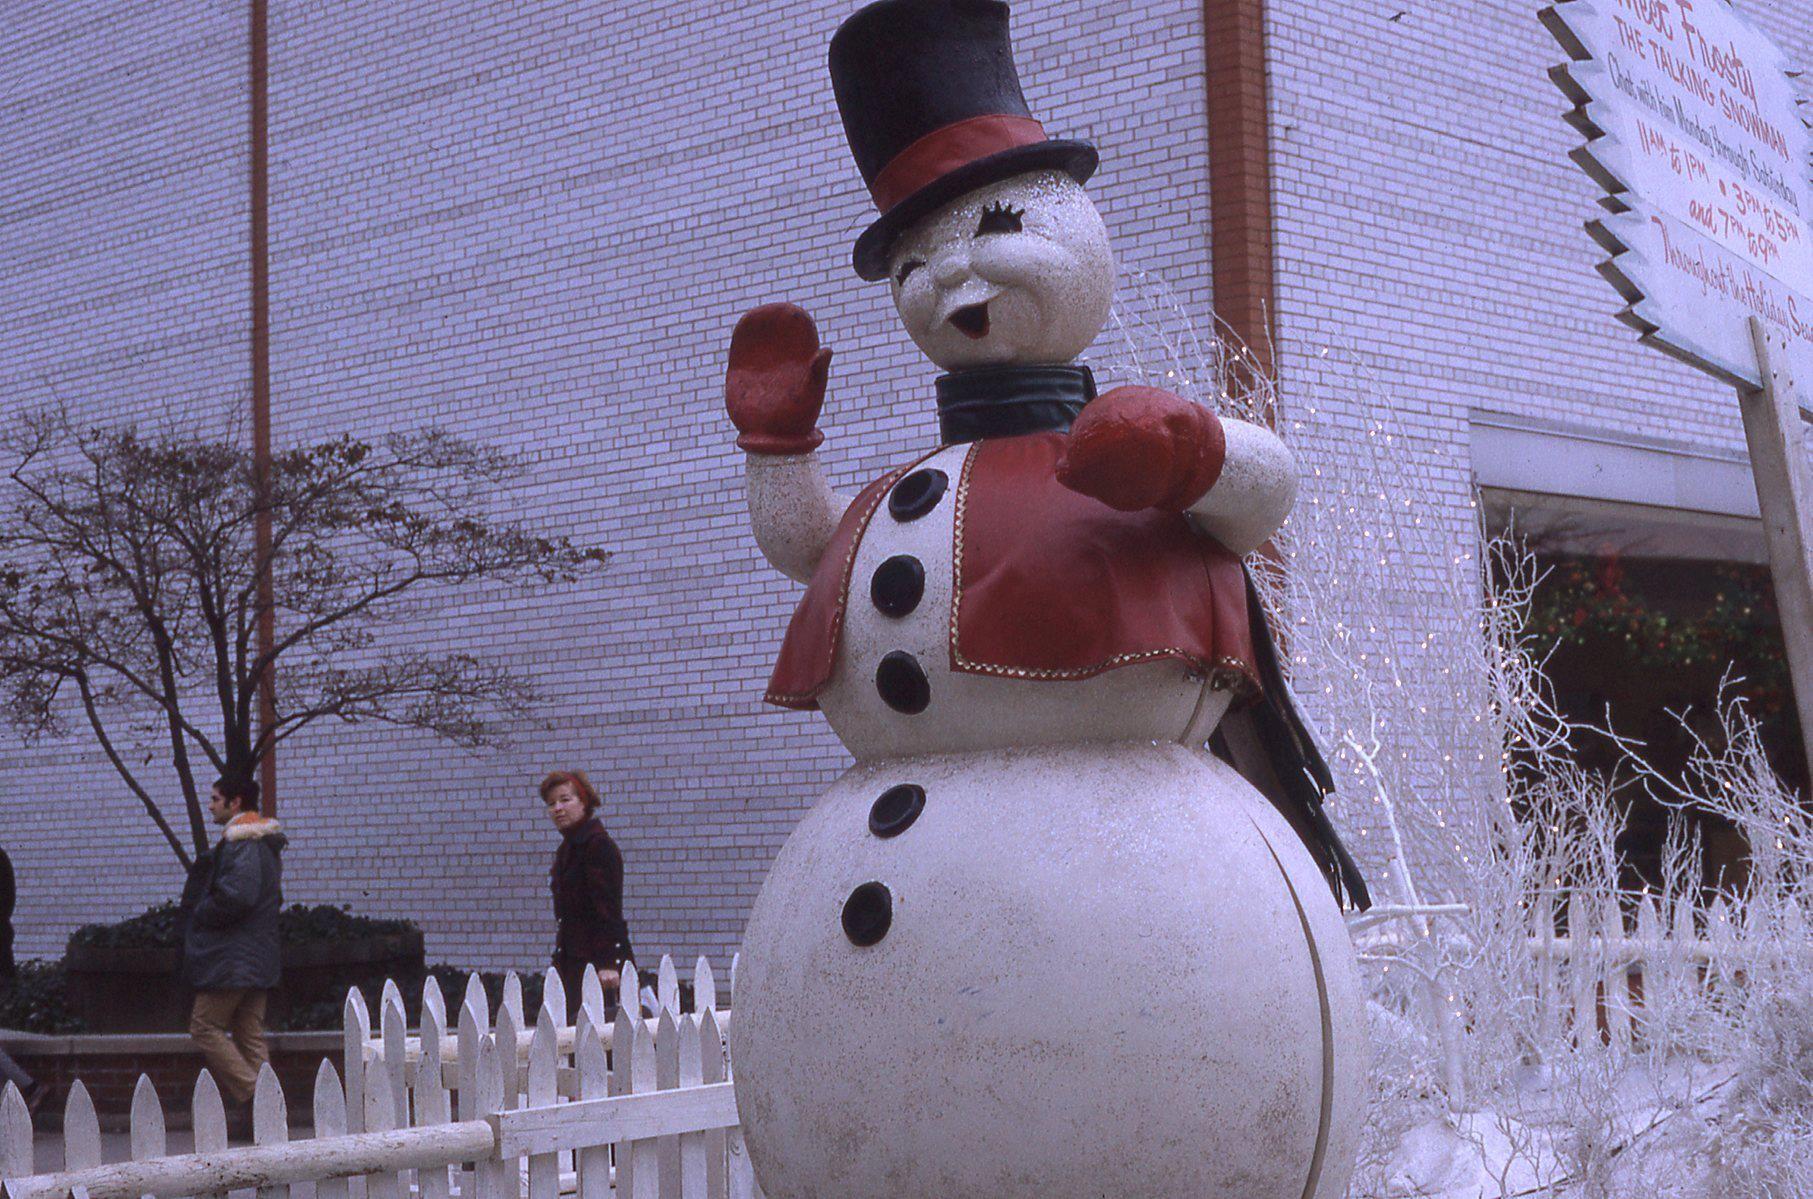 The Talking Snowman The Garden State Plaza Paramus Vintage Malls Stores Bergen County